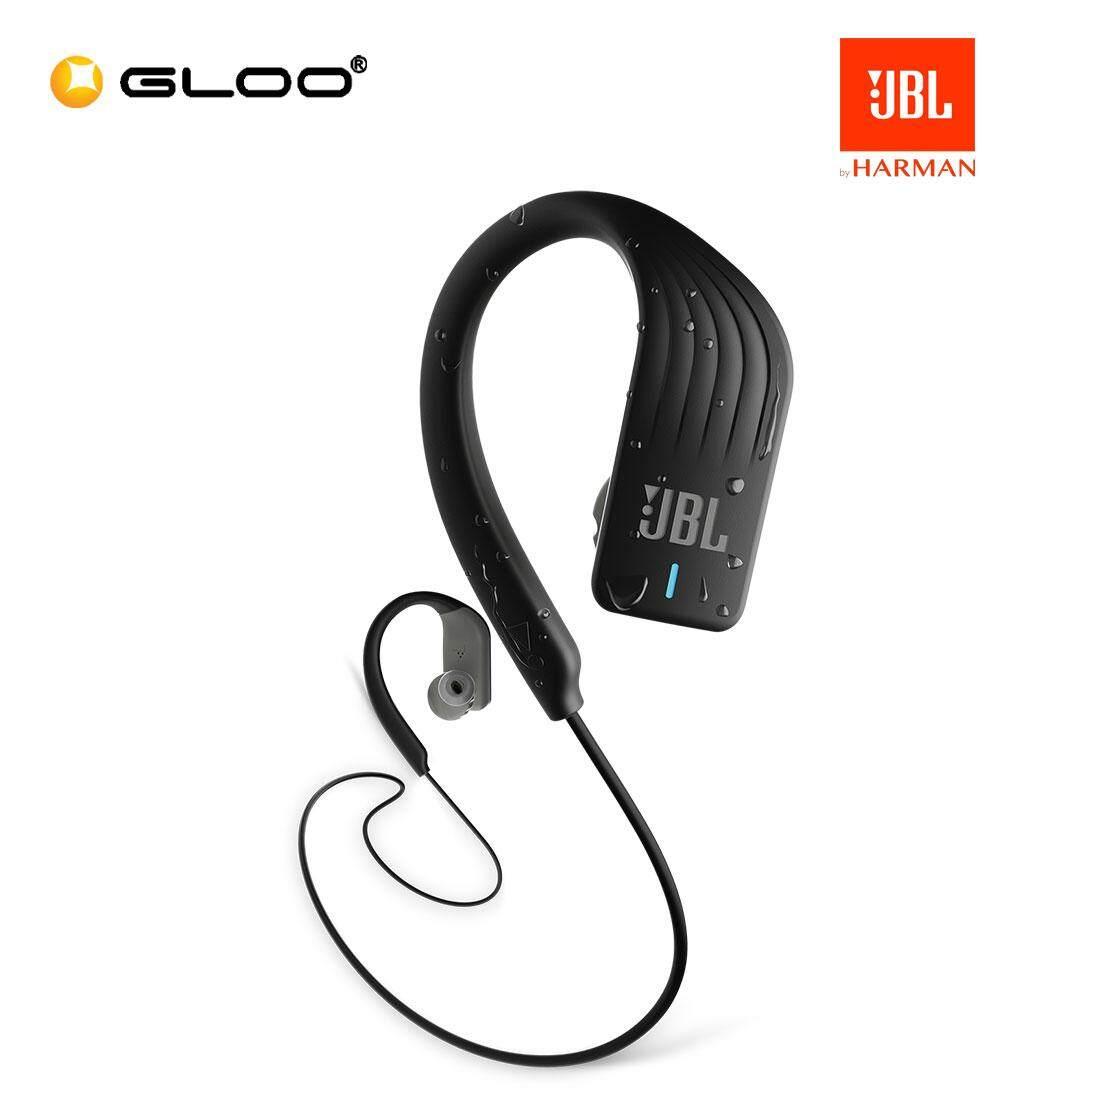 JBL Endurance Sprint Wireless Headphone Red/Blue/Black